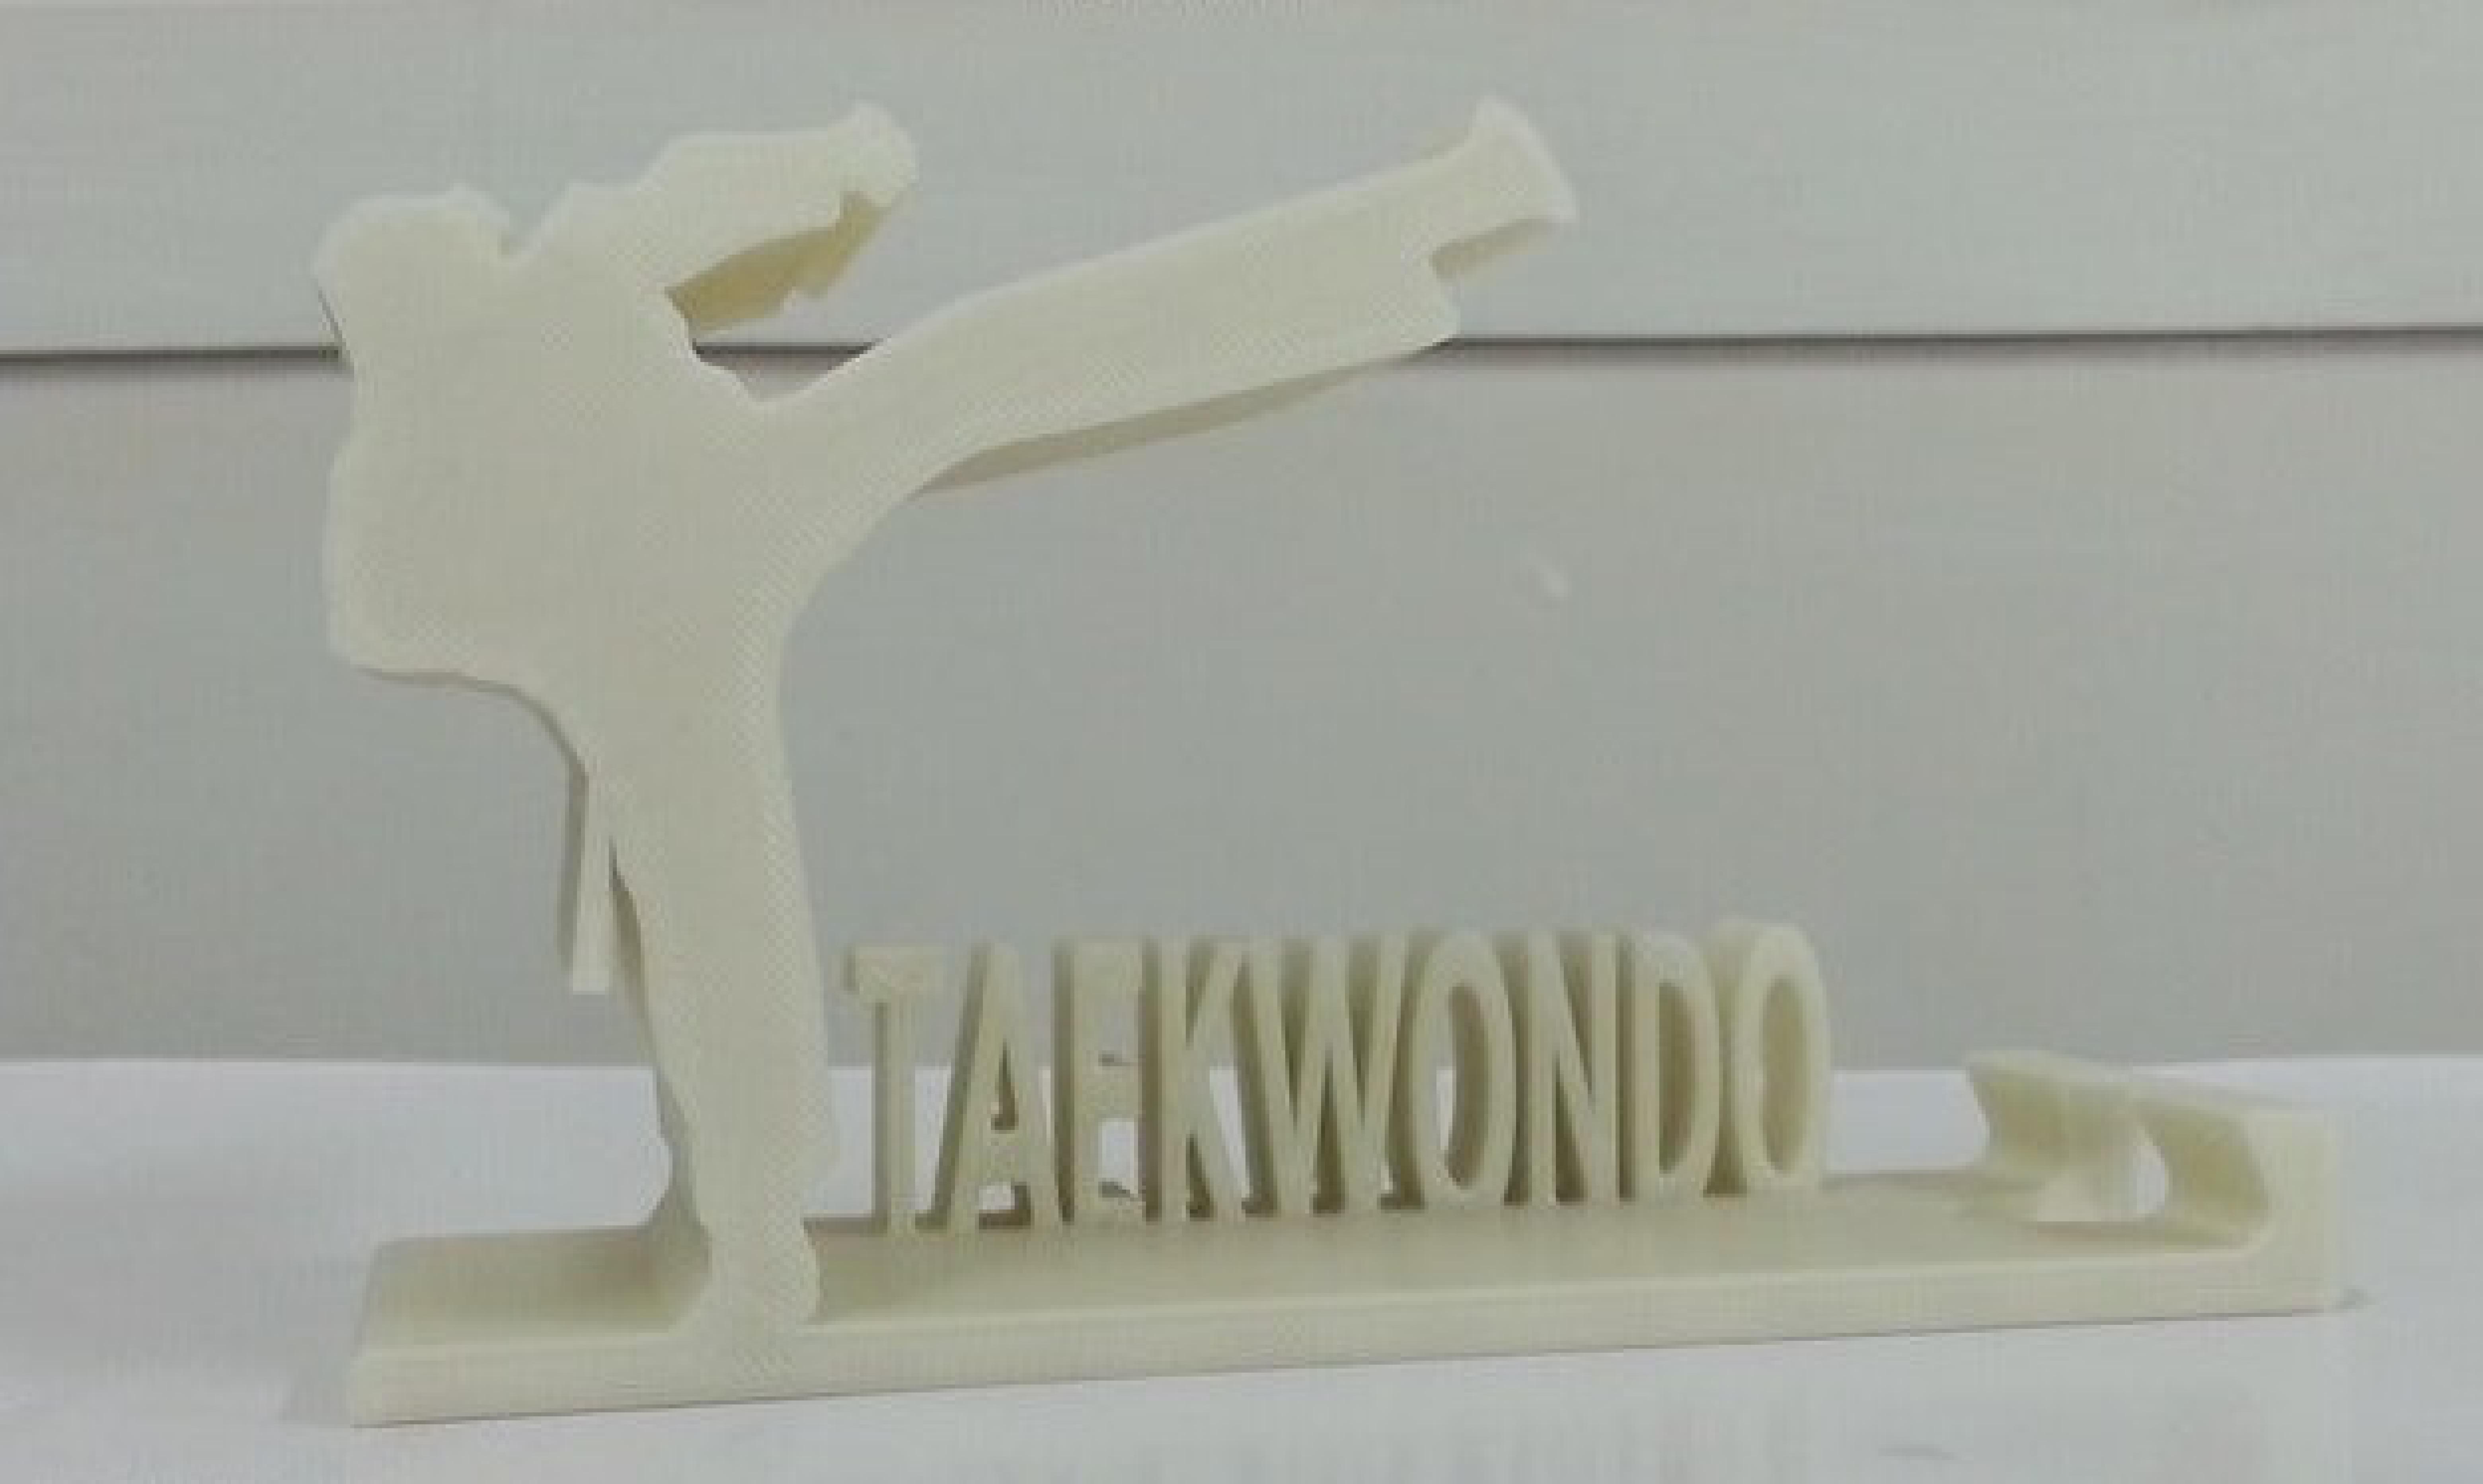 Taekwondo Görselli Masaüstü Telefon Tablet Tutucu Stand